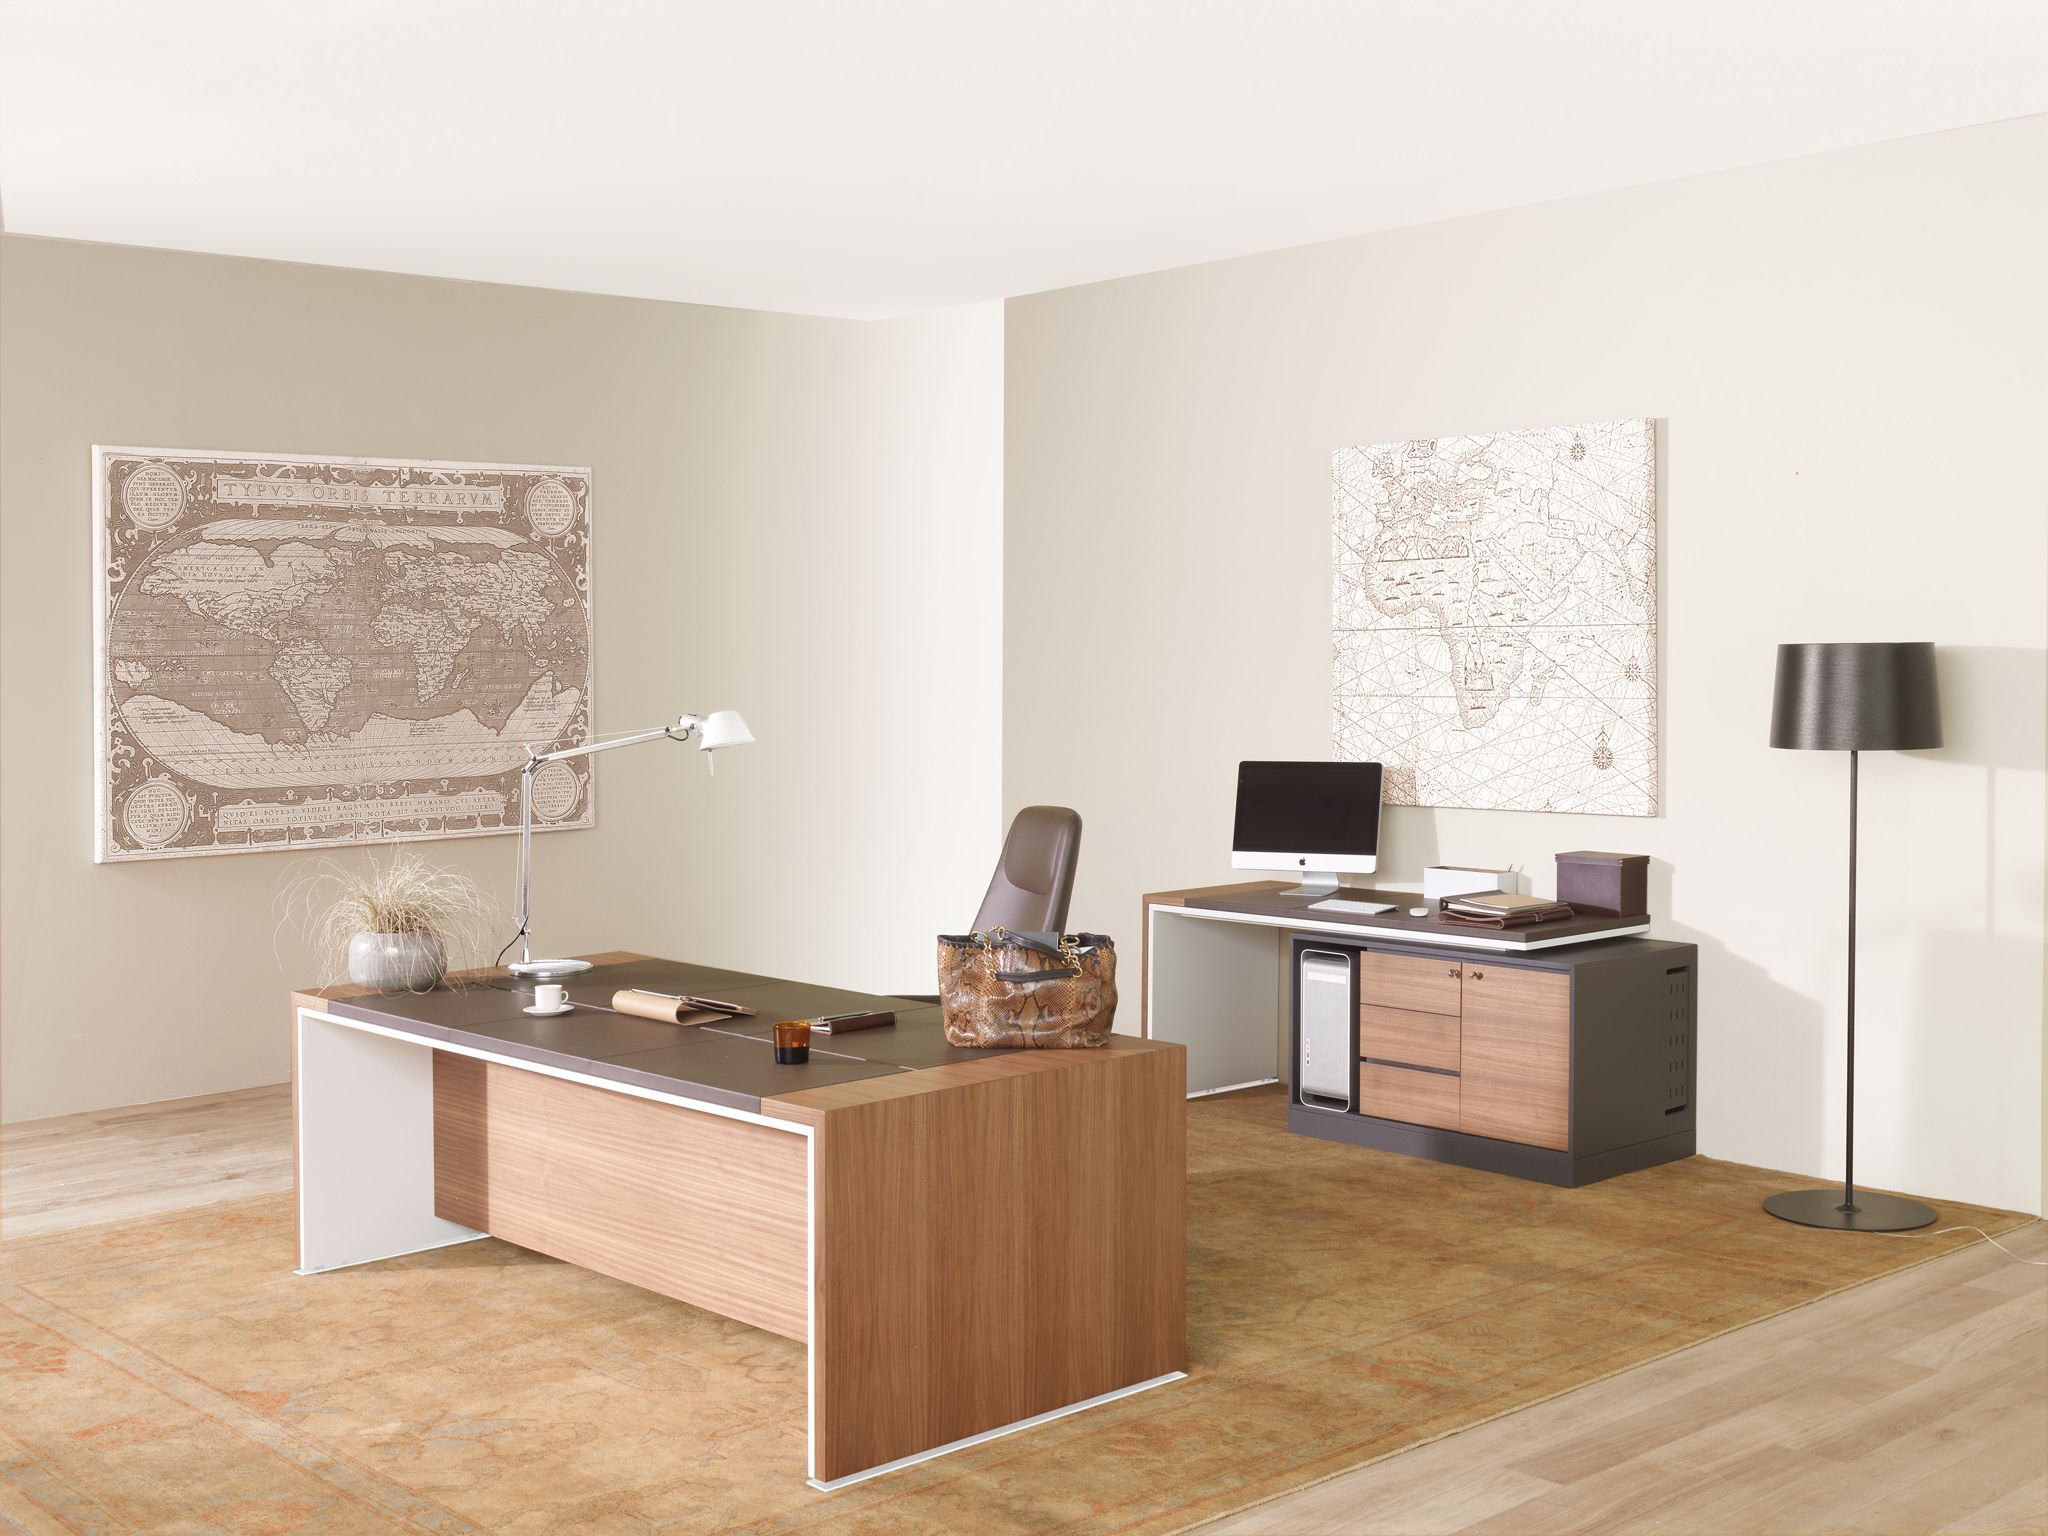 Rectangular Wooden Executive Desk Loop Estel Office Line By Group Design Alberto Stella